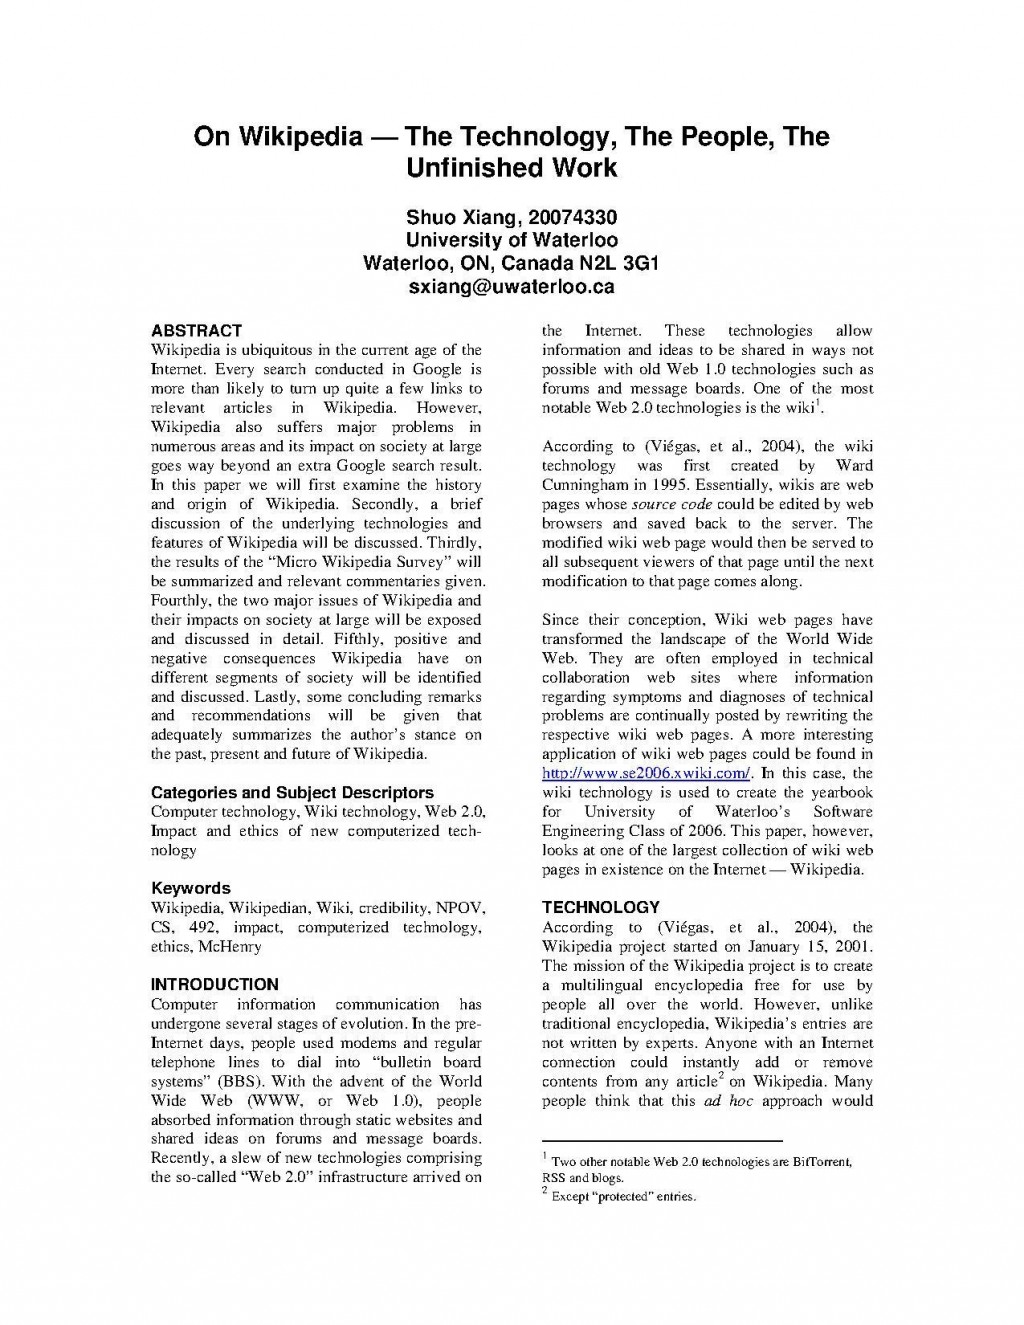 017 Essay Example Page1 1275px Shuo Xian Wikipedia Unbelievable Pdf Gujarati Free Download Argumentative Terrorism Large